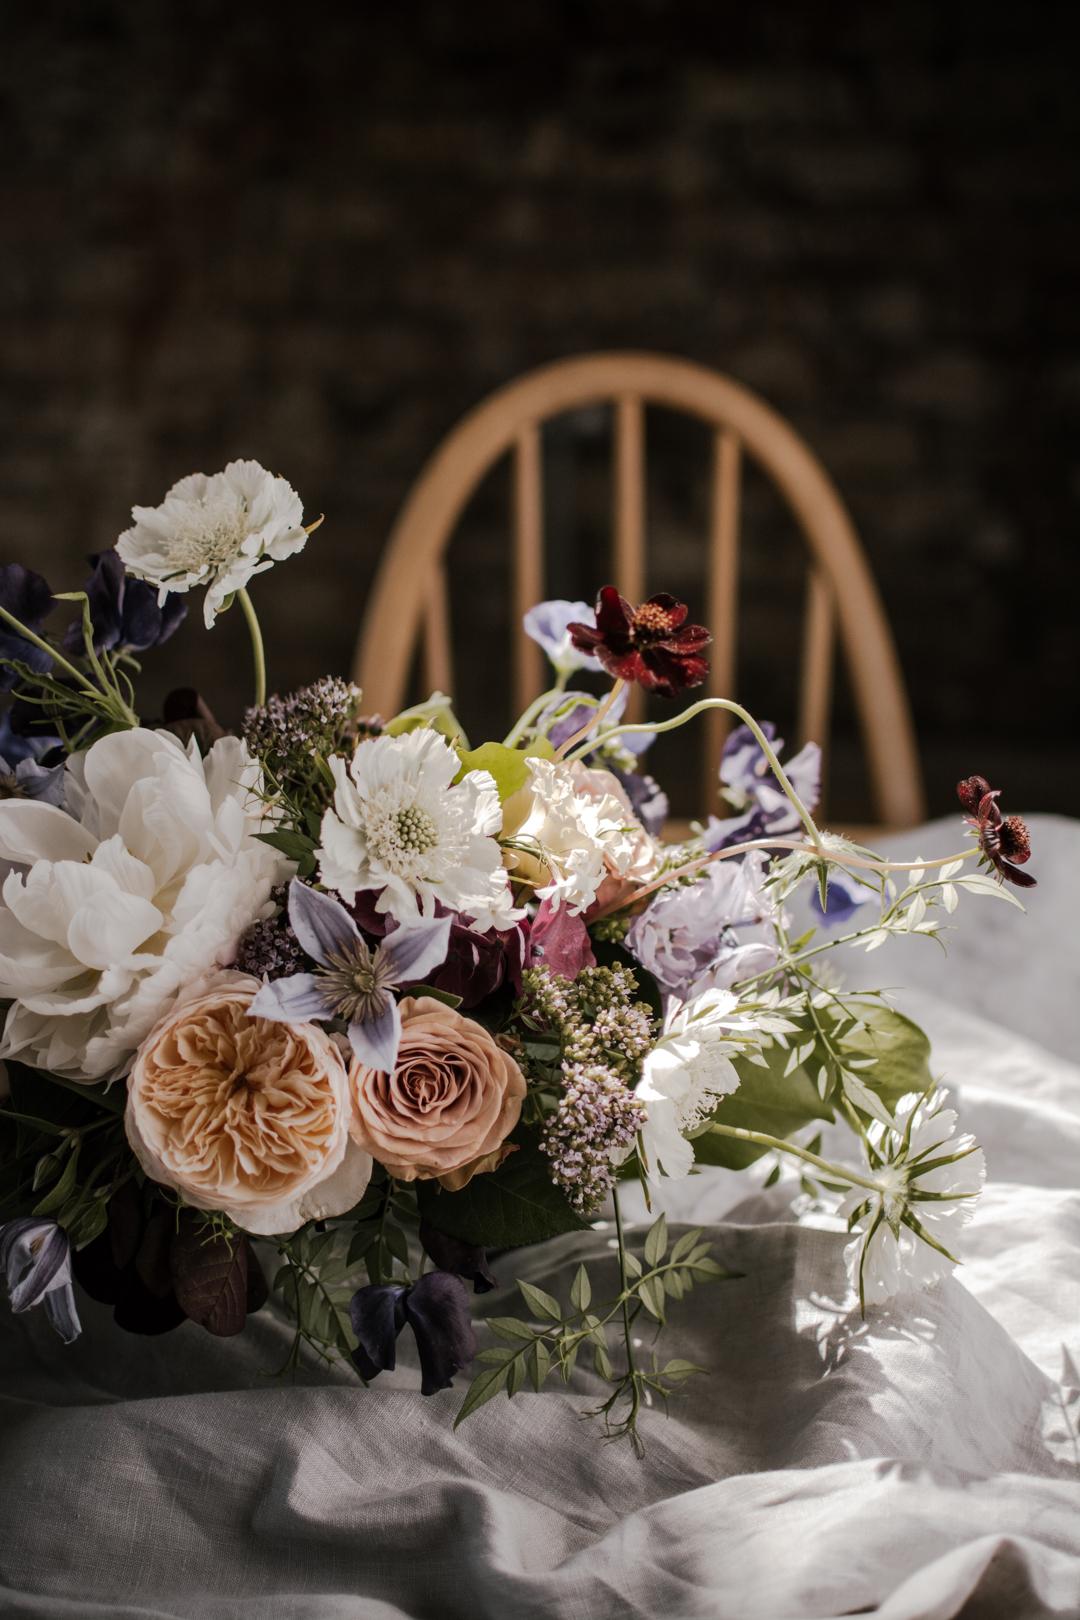 Bristol Venue Photoshoot, Wedding Flowers at the Forge-5.jpg